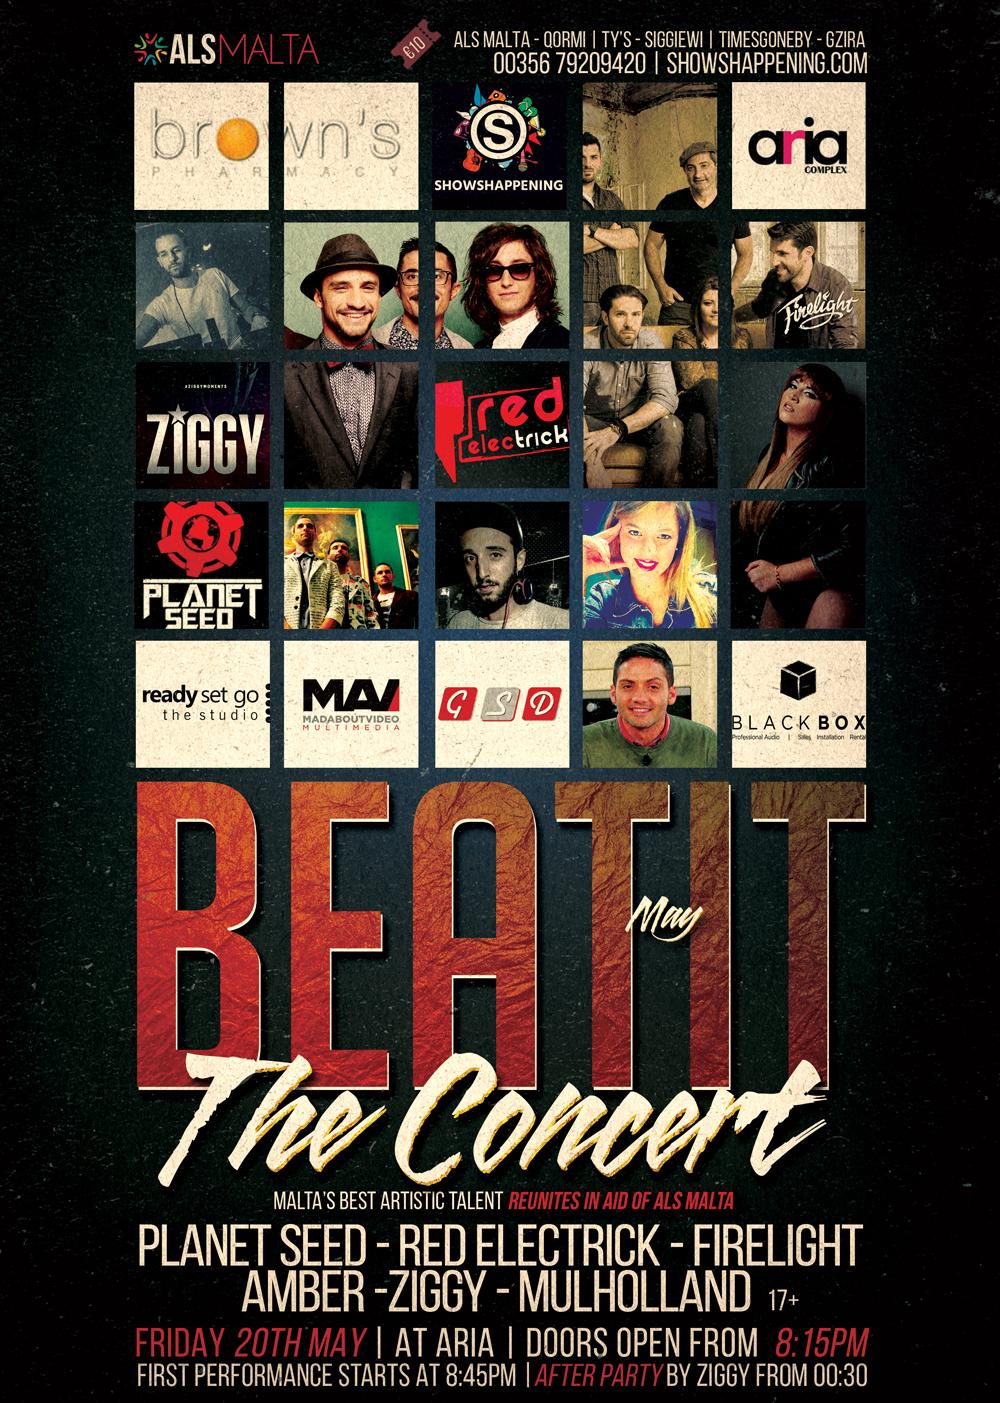 BEAT IT MAY ALS - The Concert flyer